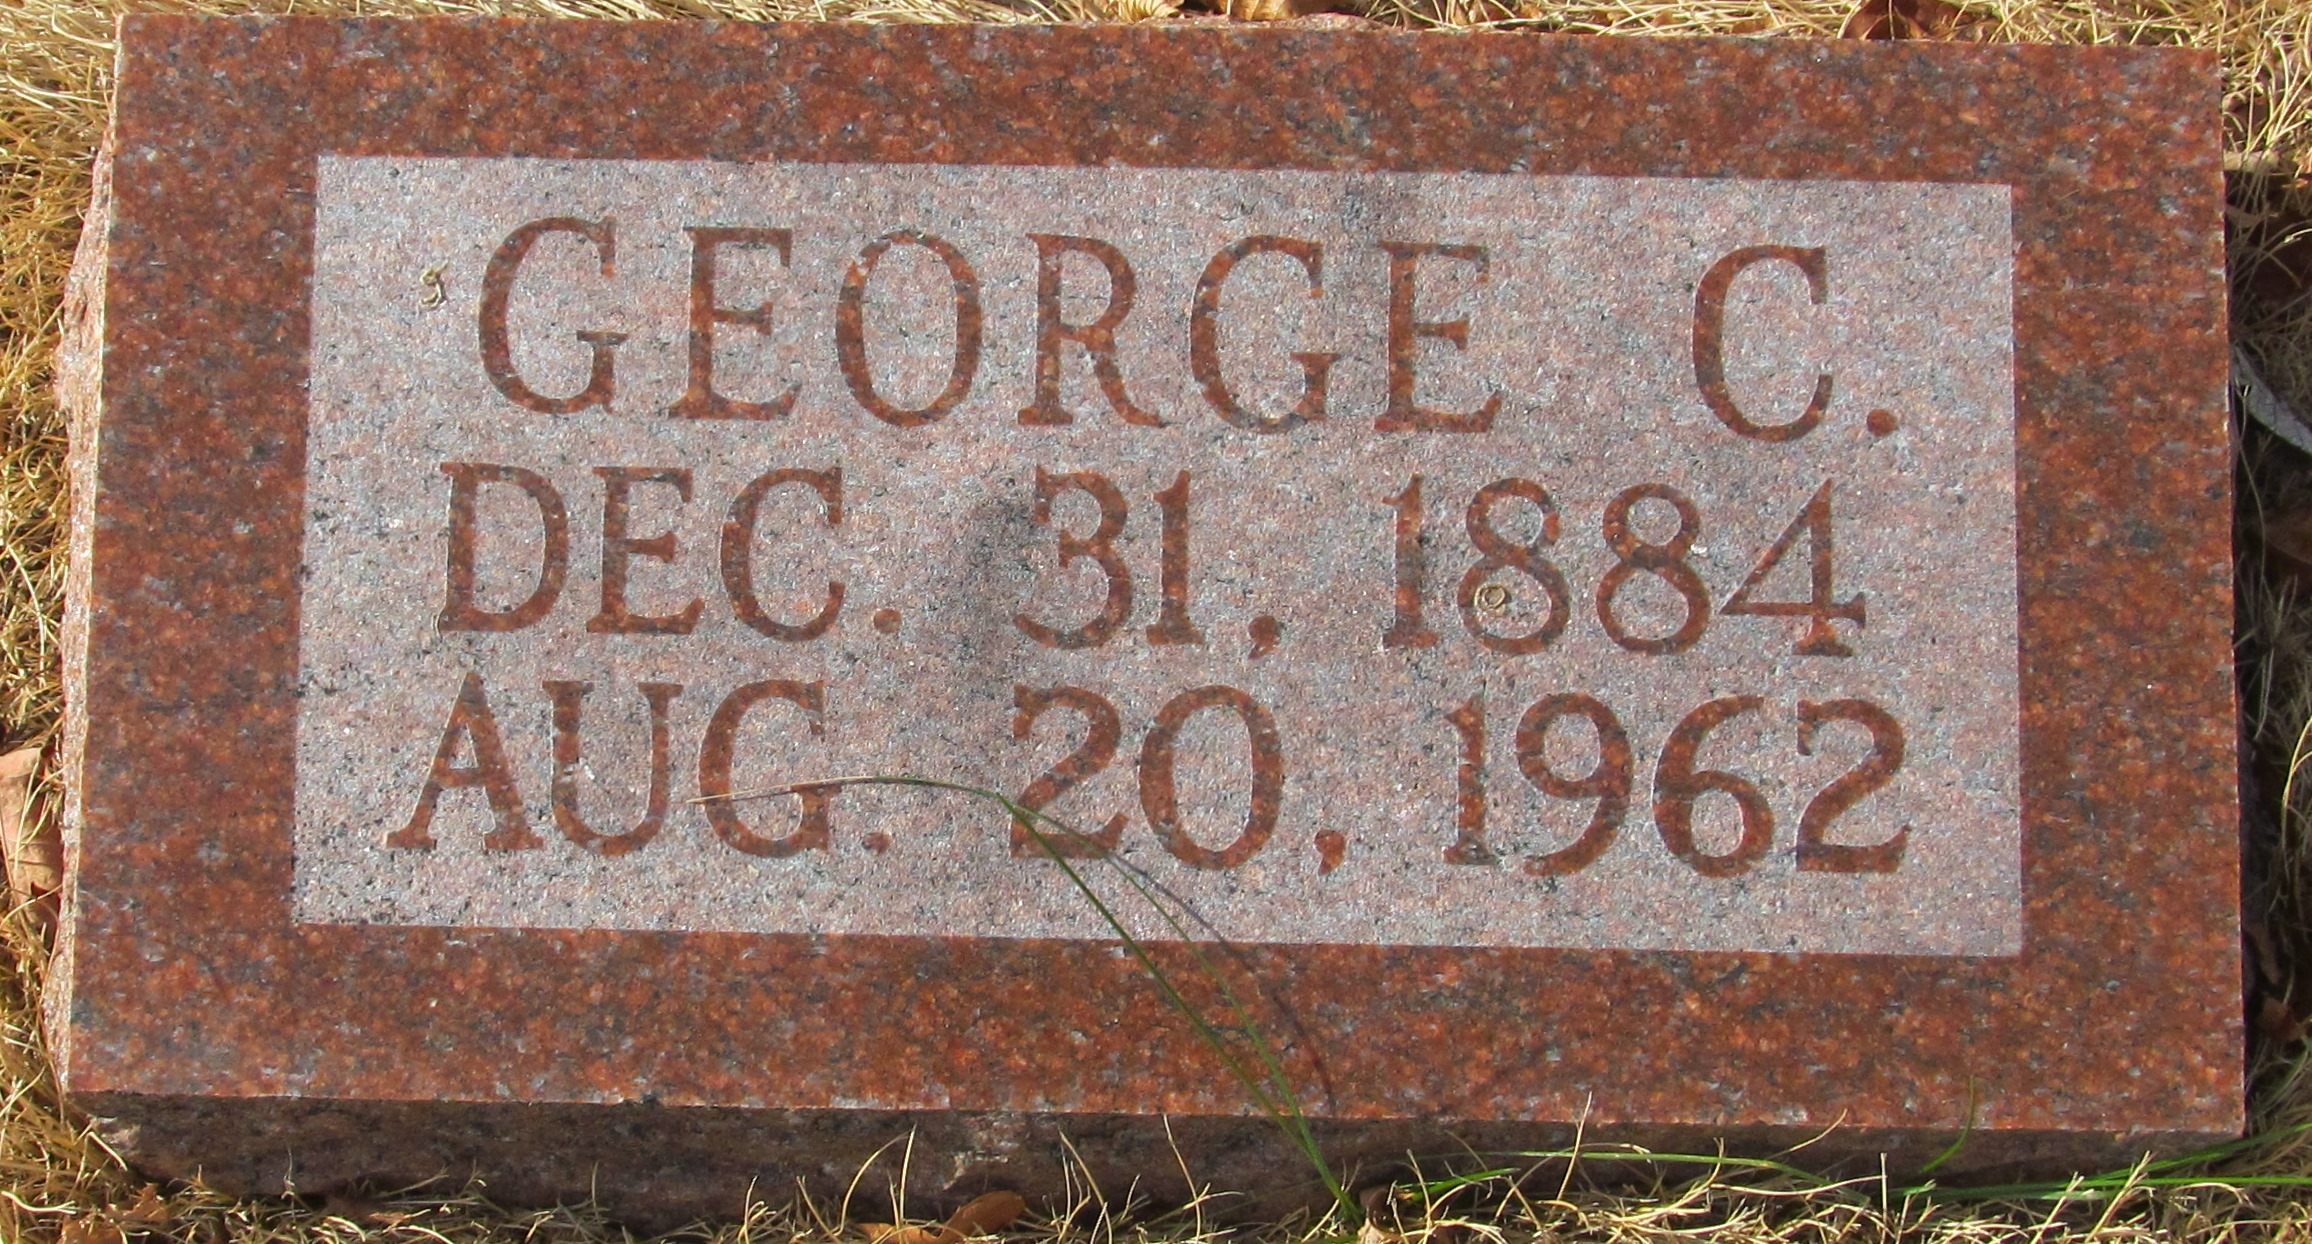 George C. Allen